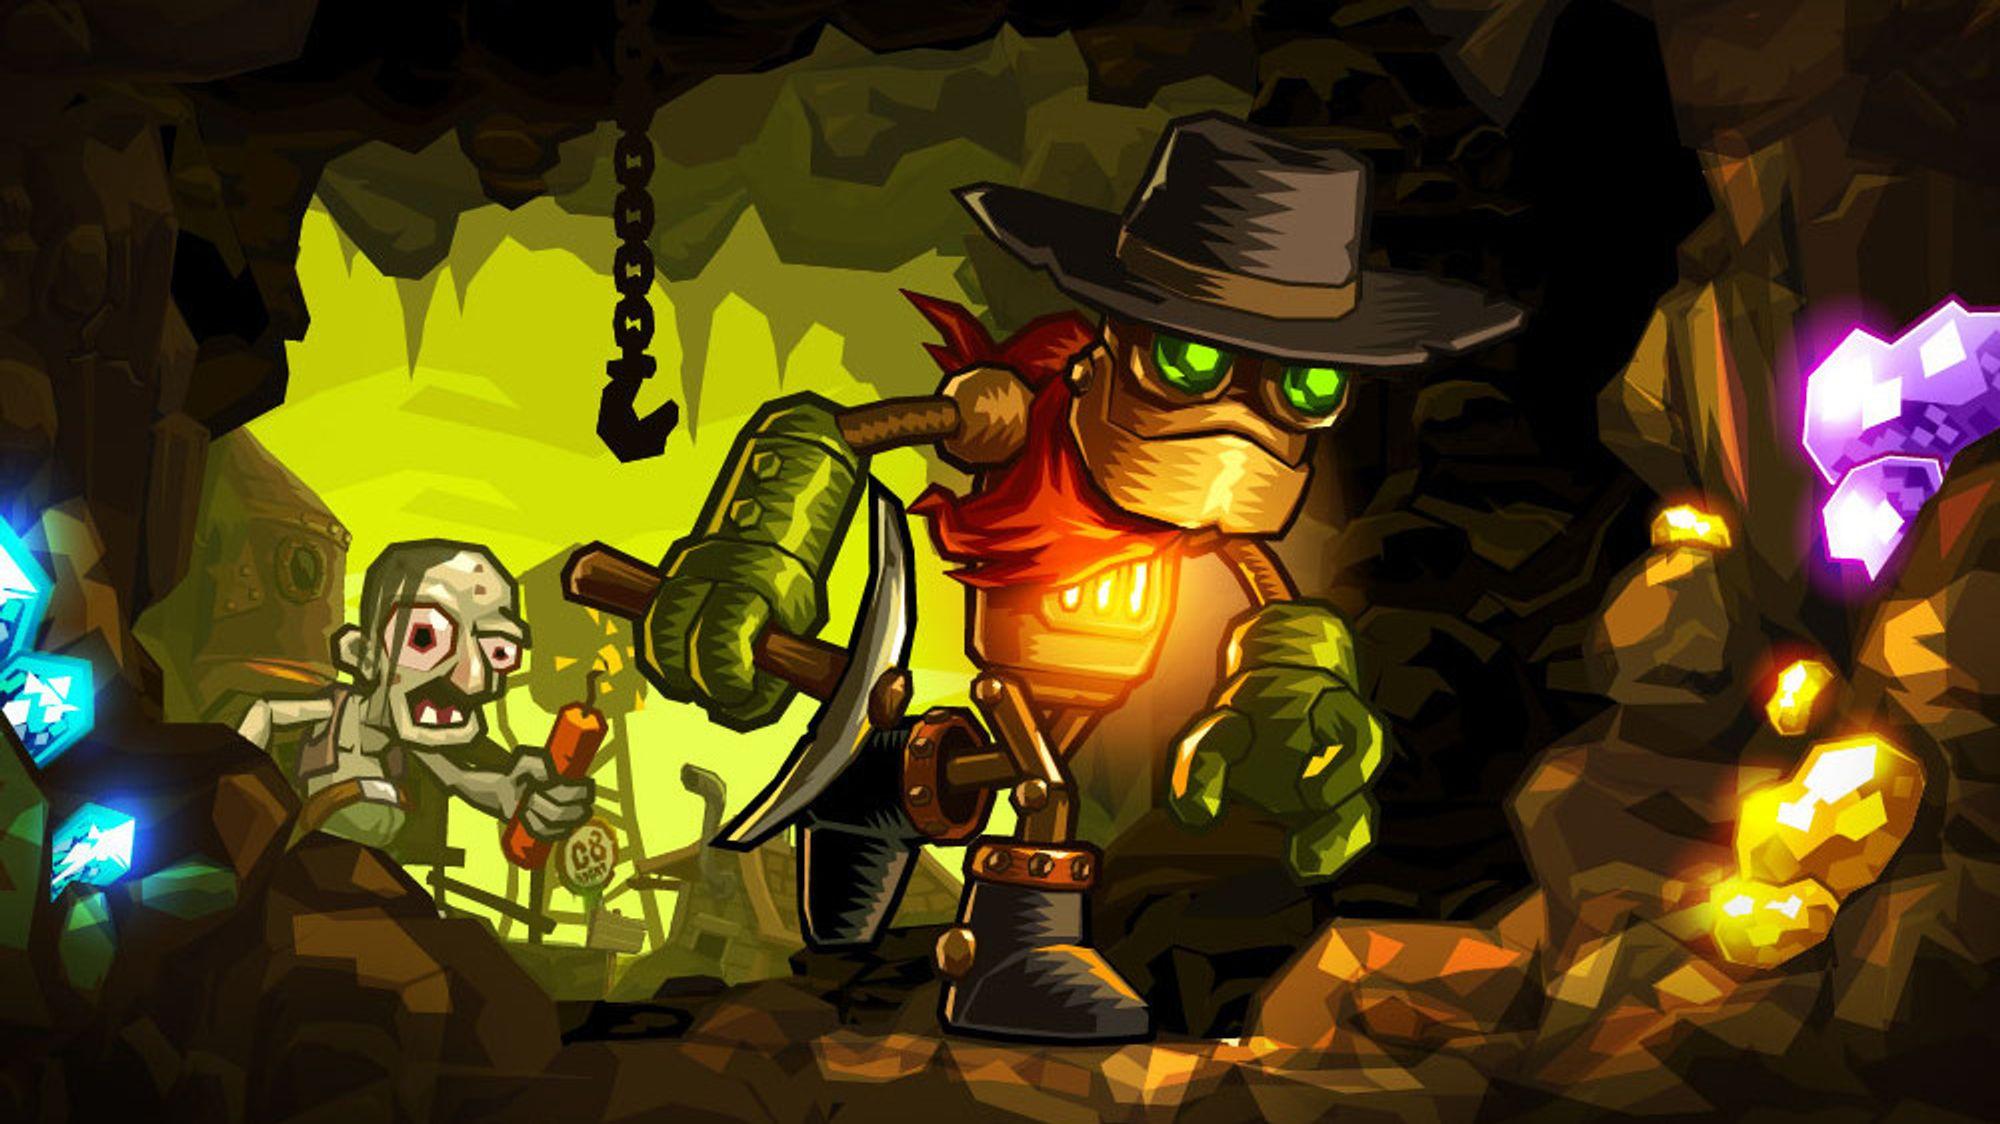 ANMELDELSE: Steamworld Dig